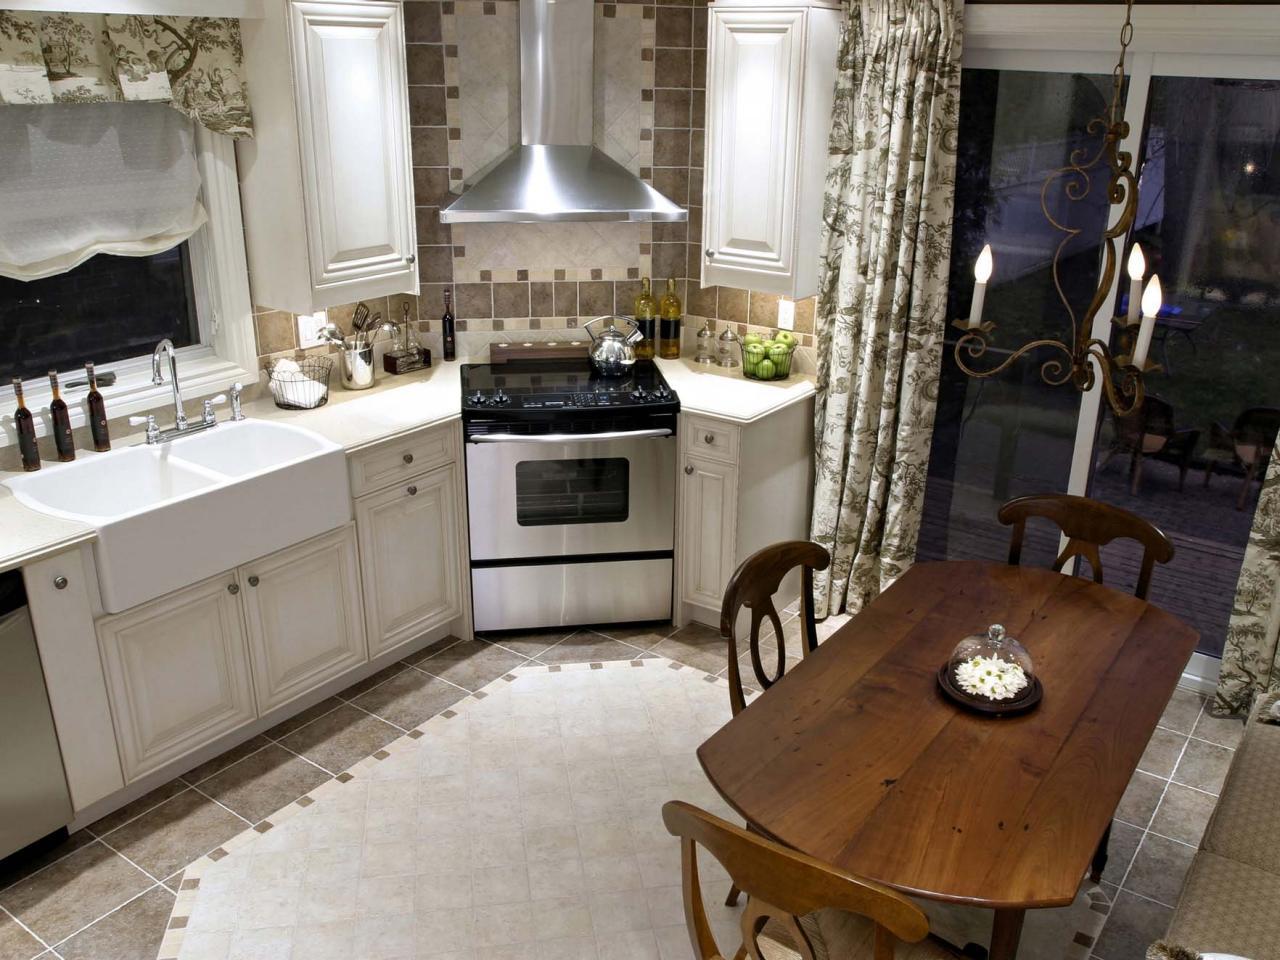 candice olson kitchen design pictures photo - 6